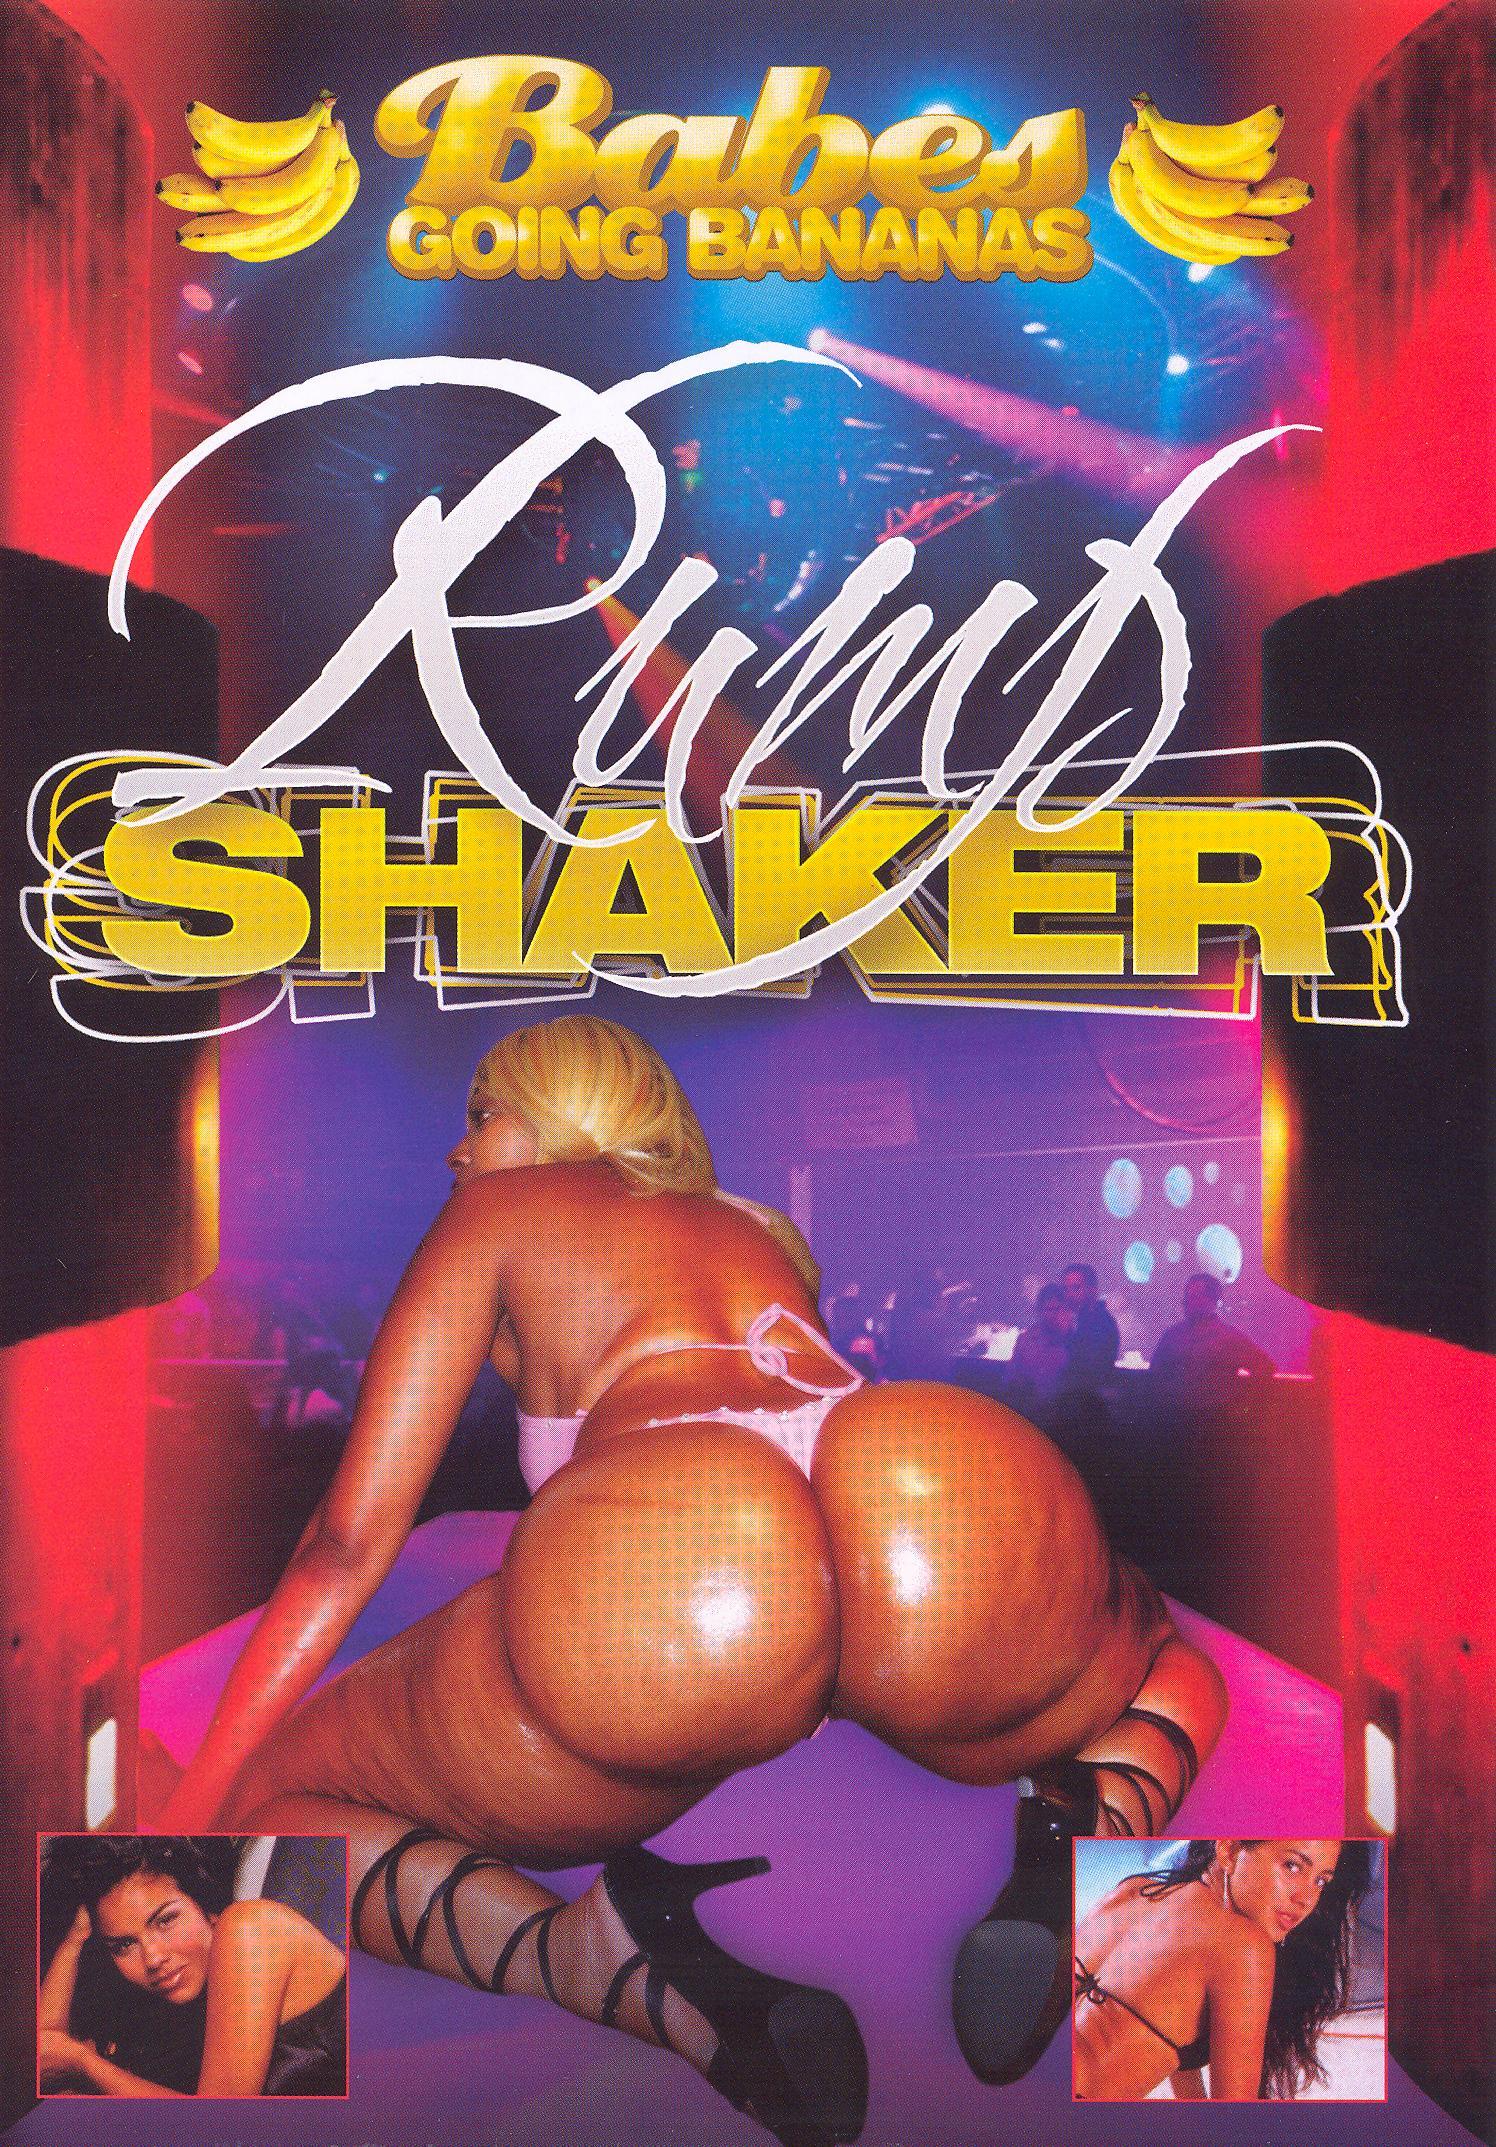 Babes Going Bananas: Rump Shaker